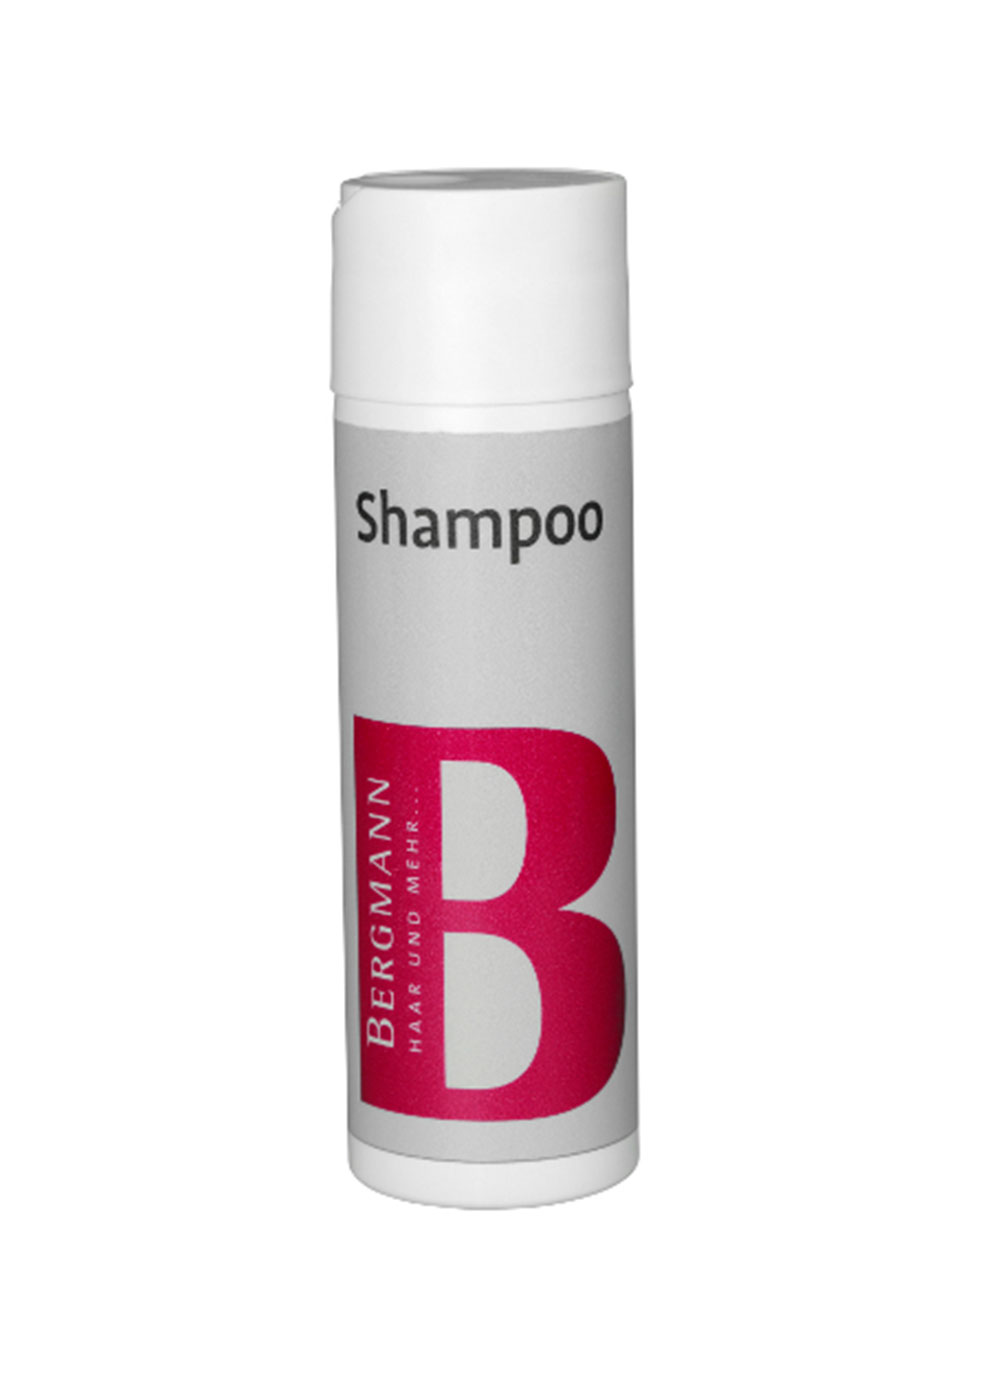 Bergmann Zubehör - Kunsthaar Shampoo 1000ml